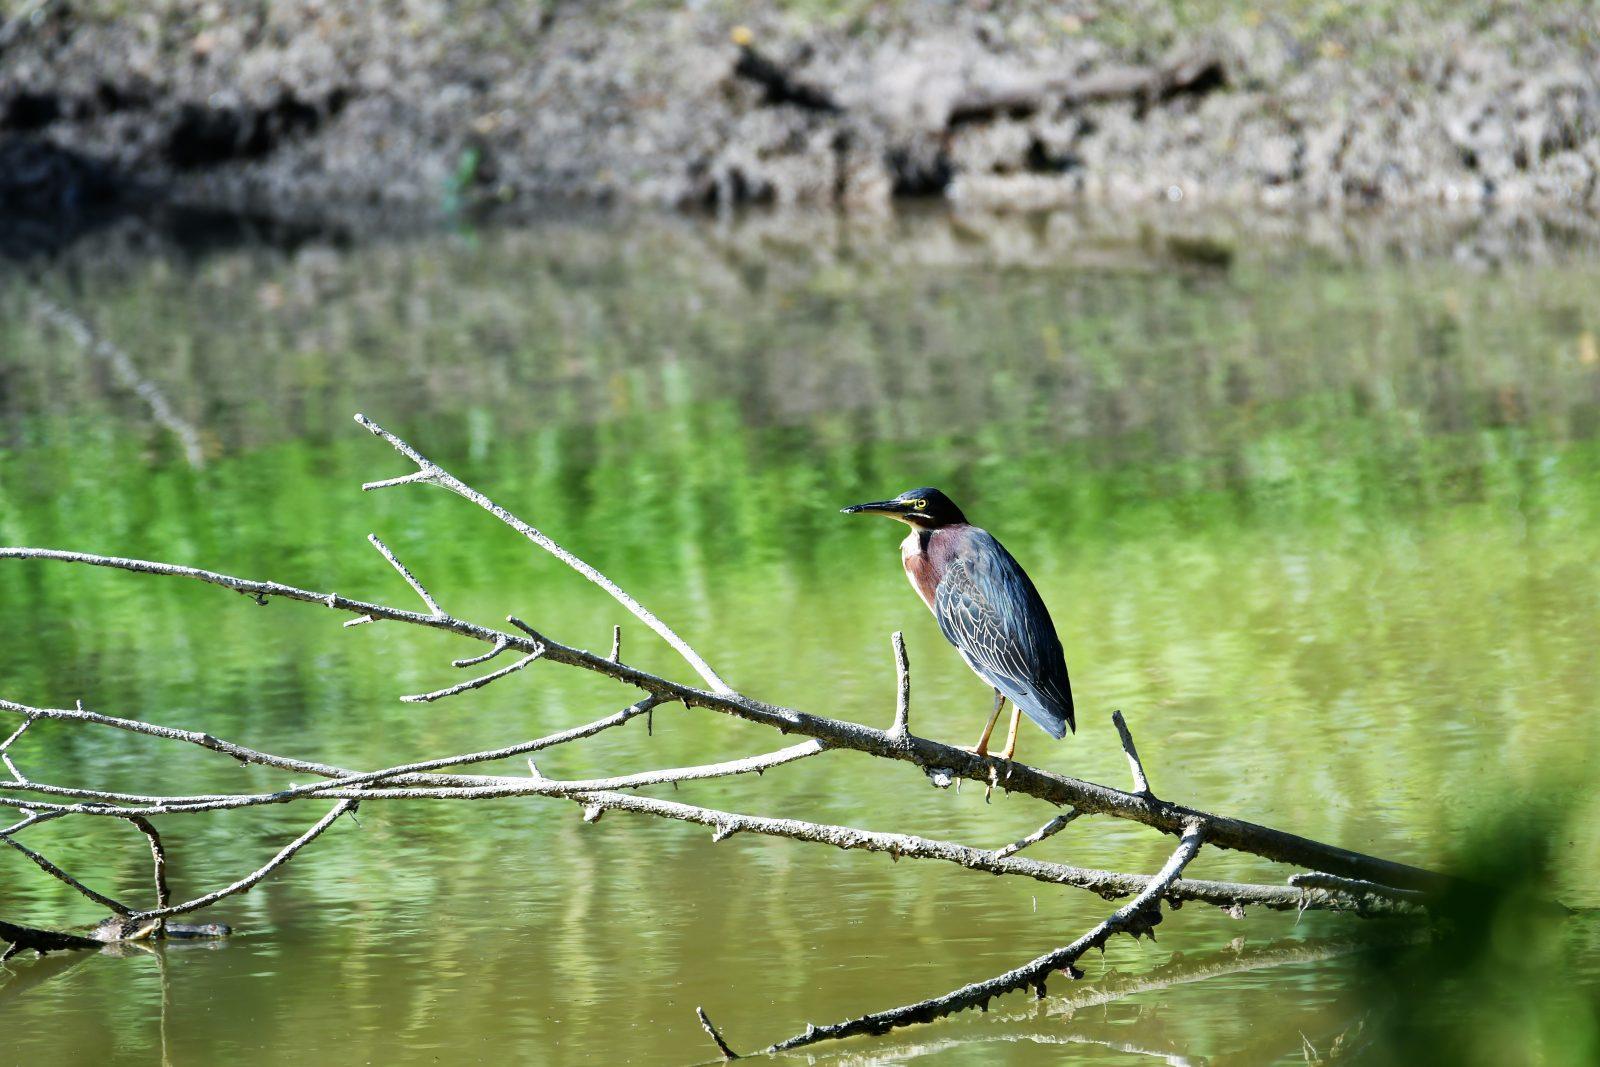 Green Heron Visiting the Pond